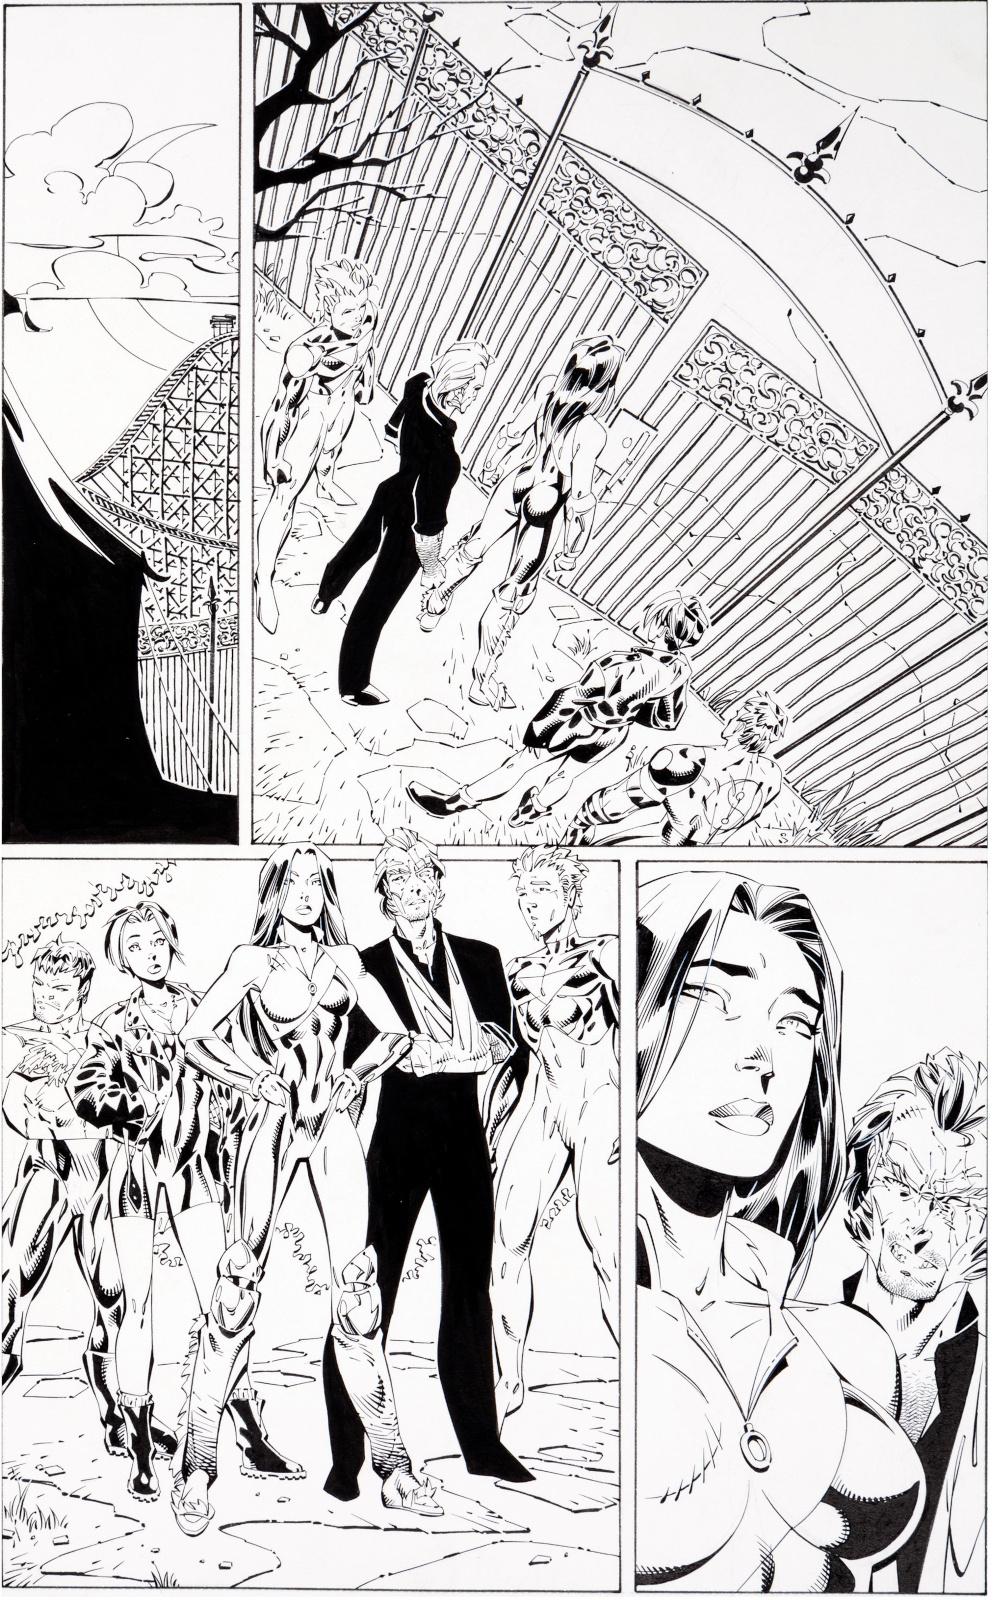 Gen 13 issue 8 page 14 by J. Scott Campbell and Alex Garner